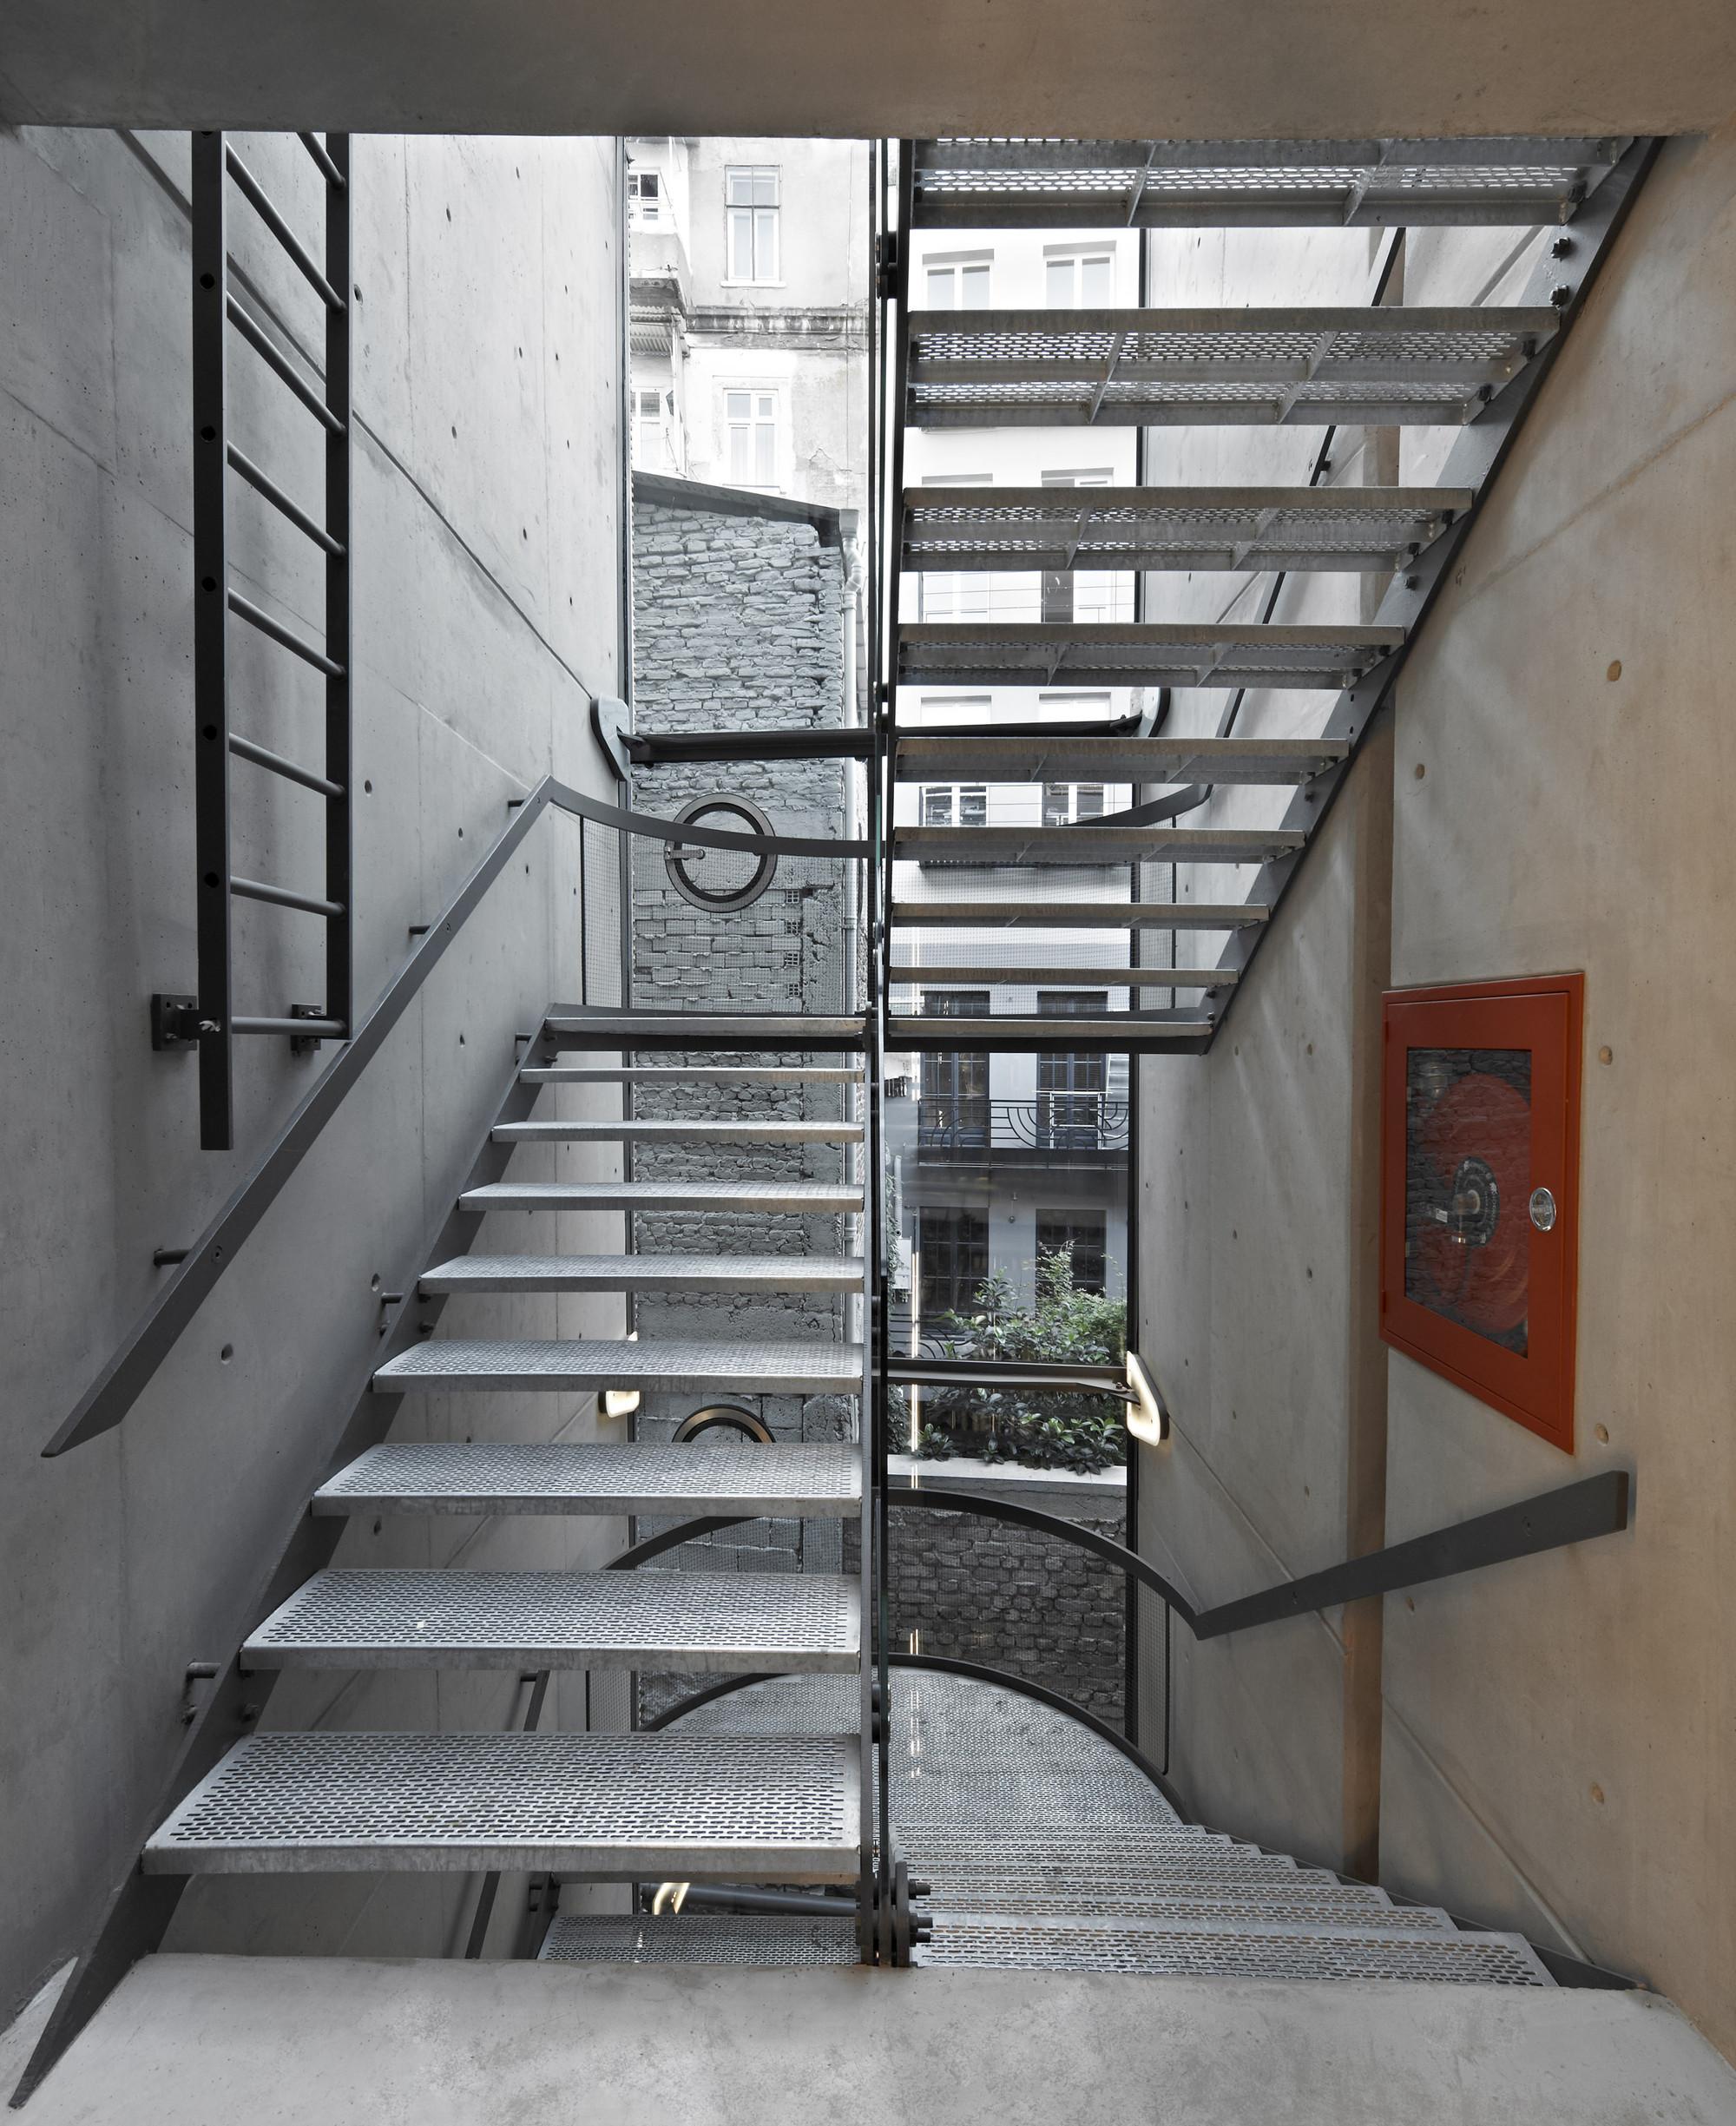 gallery of pera 25 alata architecture consulting 15. Black Bedroom Furniture Sets. Home Design Ideas